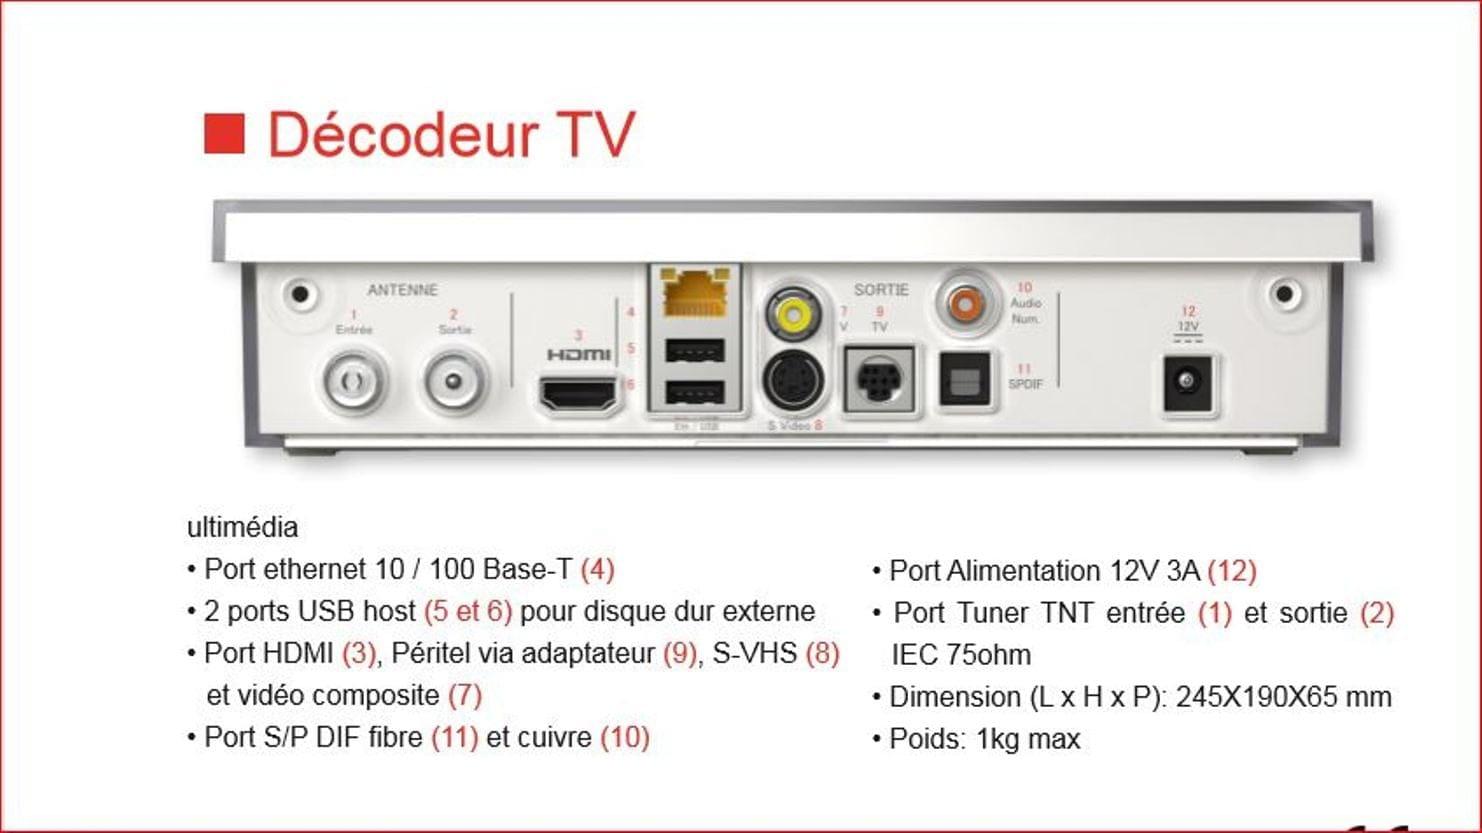 decodeur tv free ne fonctionne plus